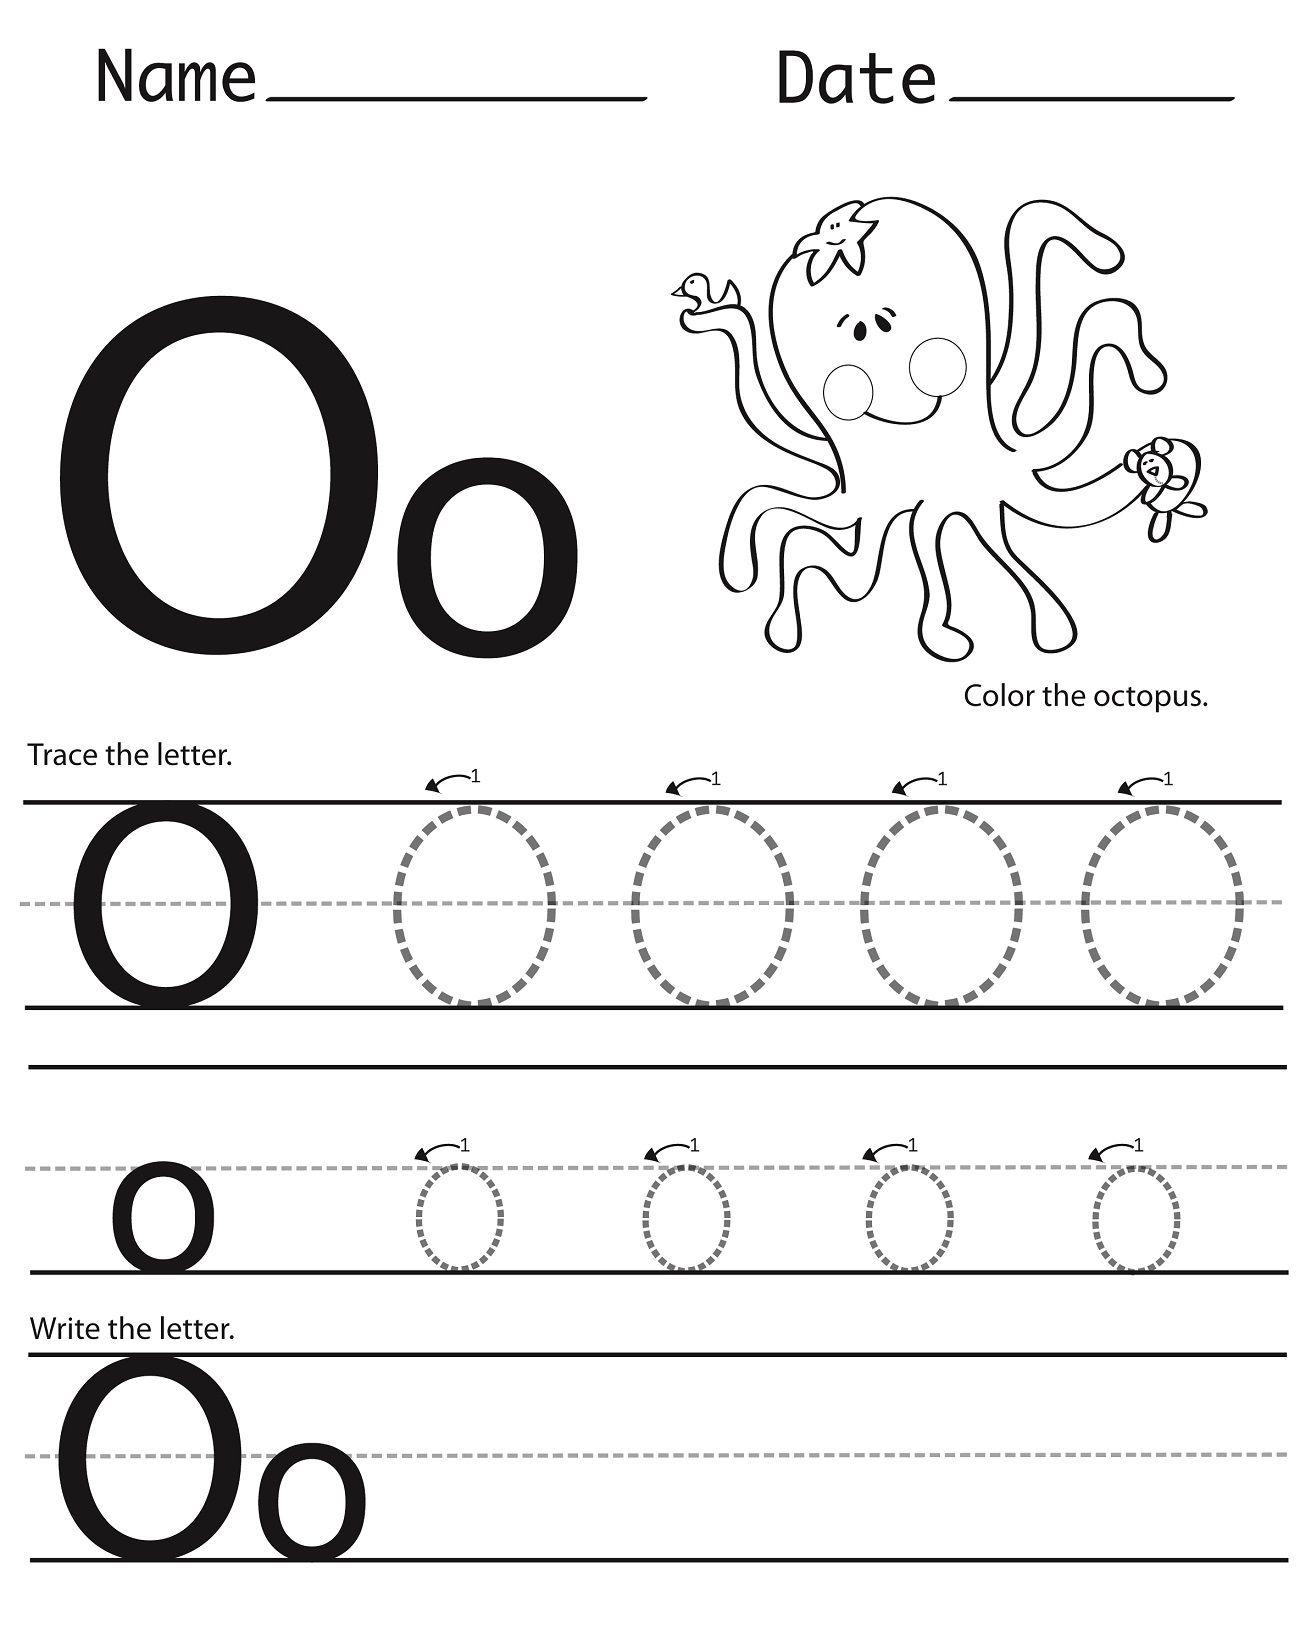 Grade 5 Math Worksheets